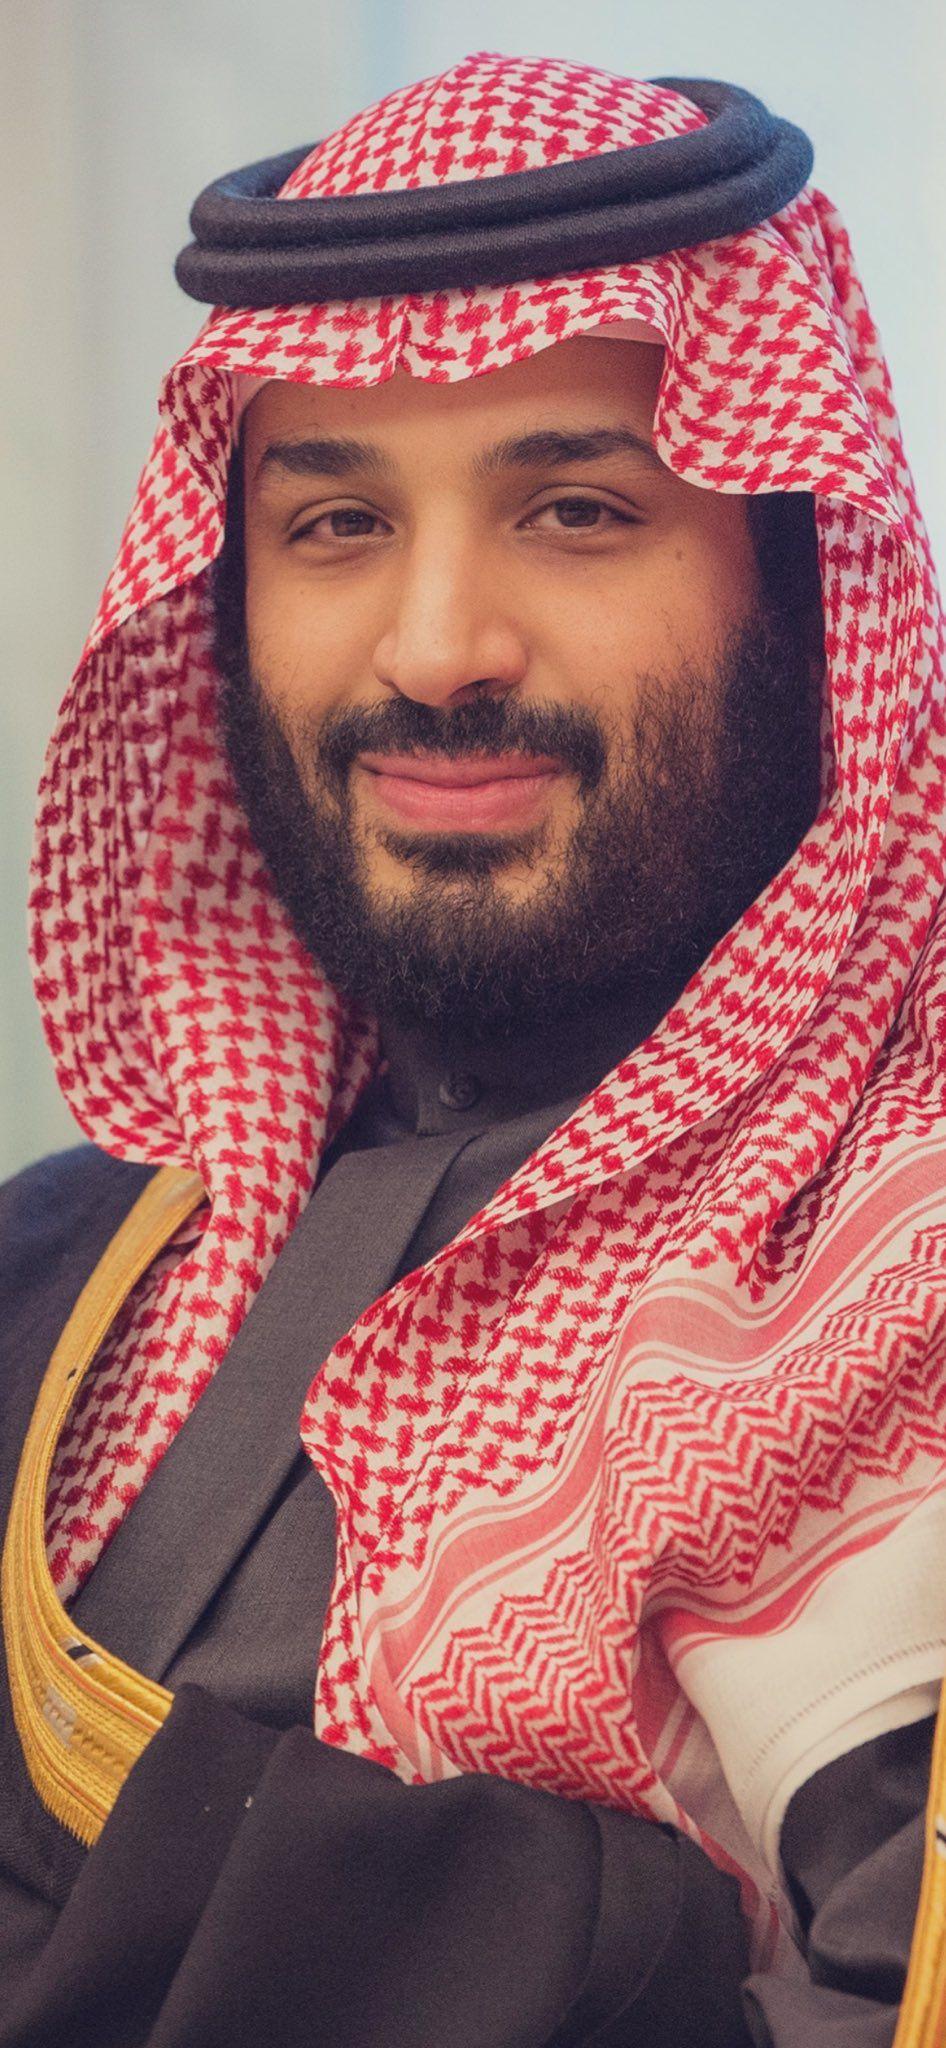 Pin By Haya Alotaibi On Portrait Arab Men Fashion Saudi Men National Day Saudi